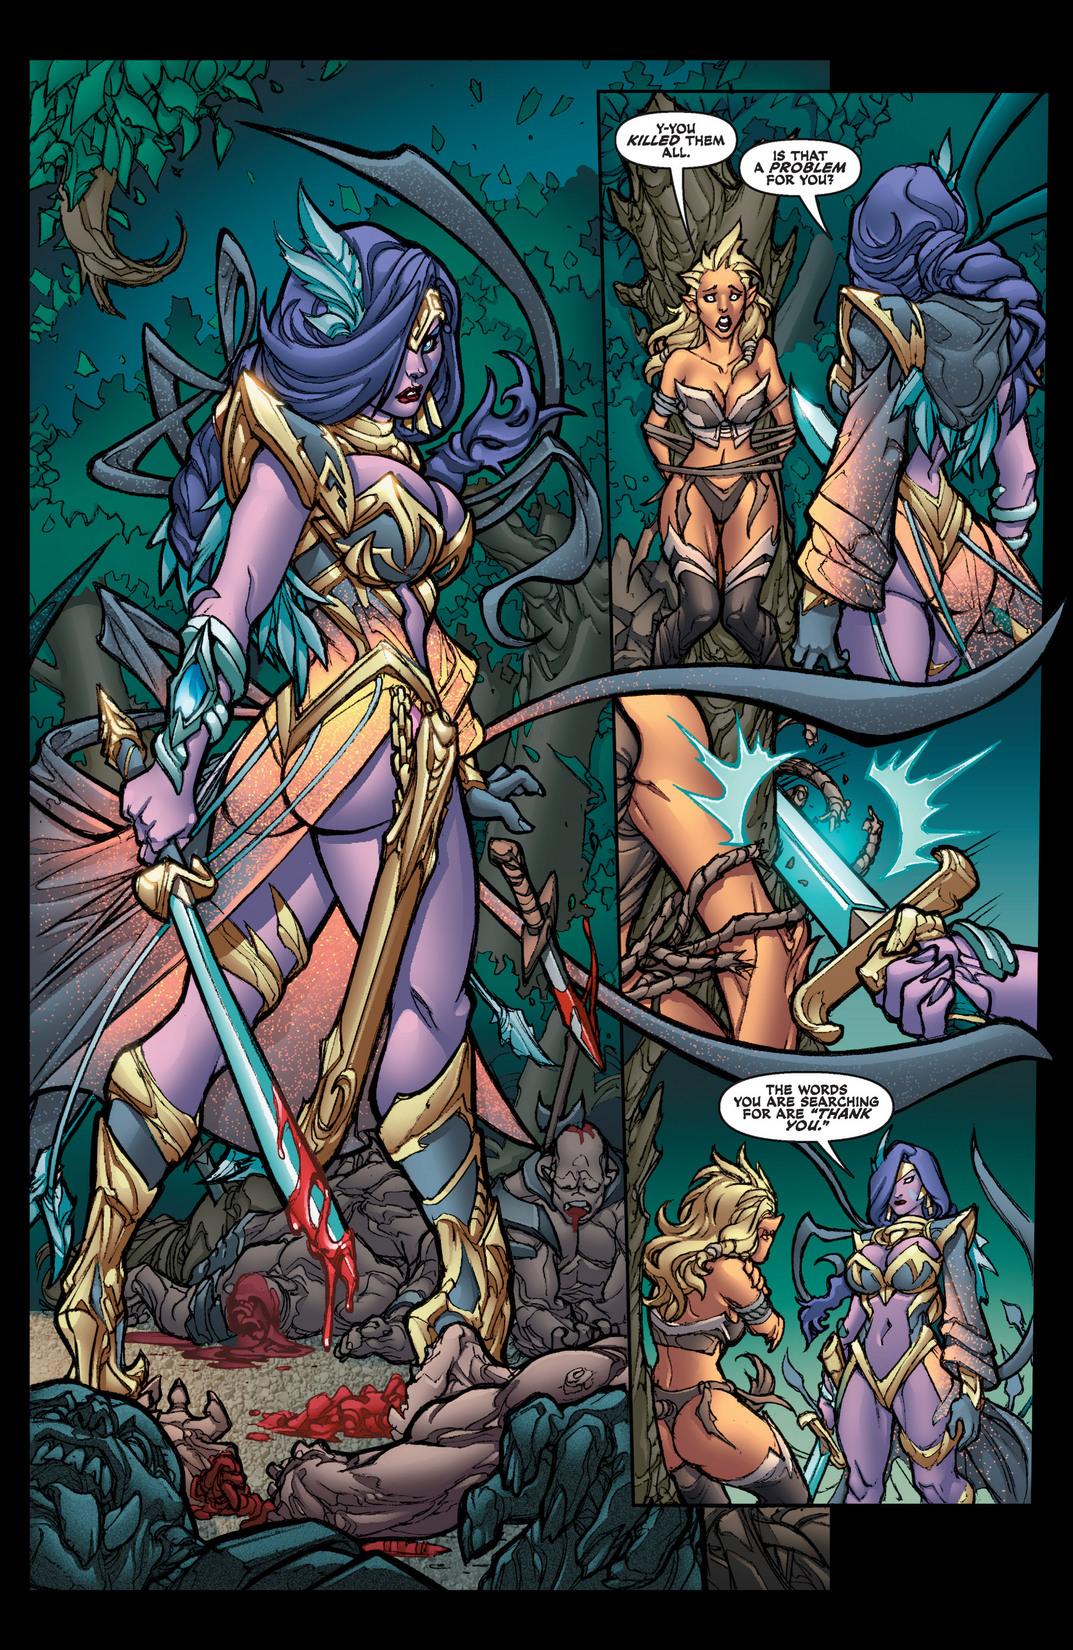 Read online Jirni comic -  Issue #1 - 8